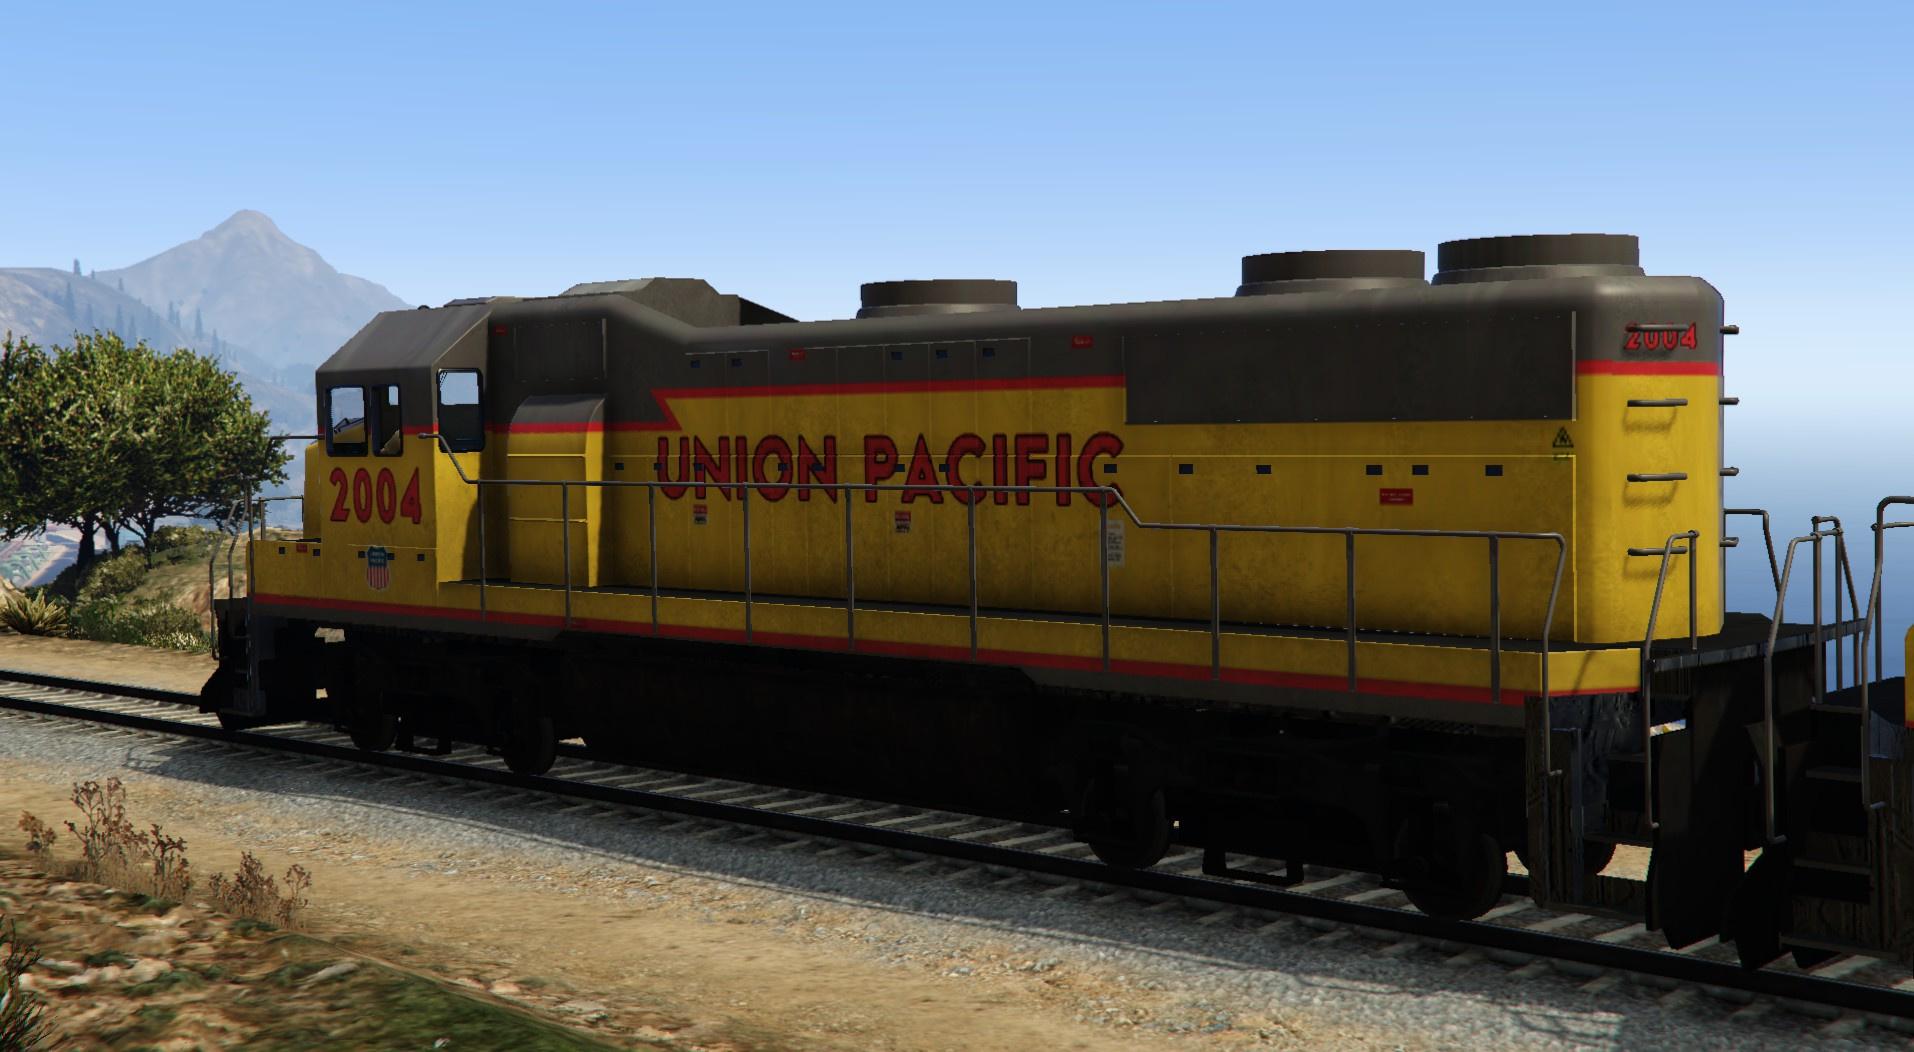 Union Pacific Freight Train Gta5 Mods Com